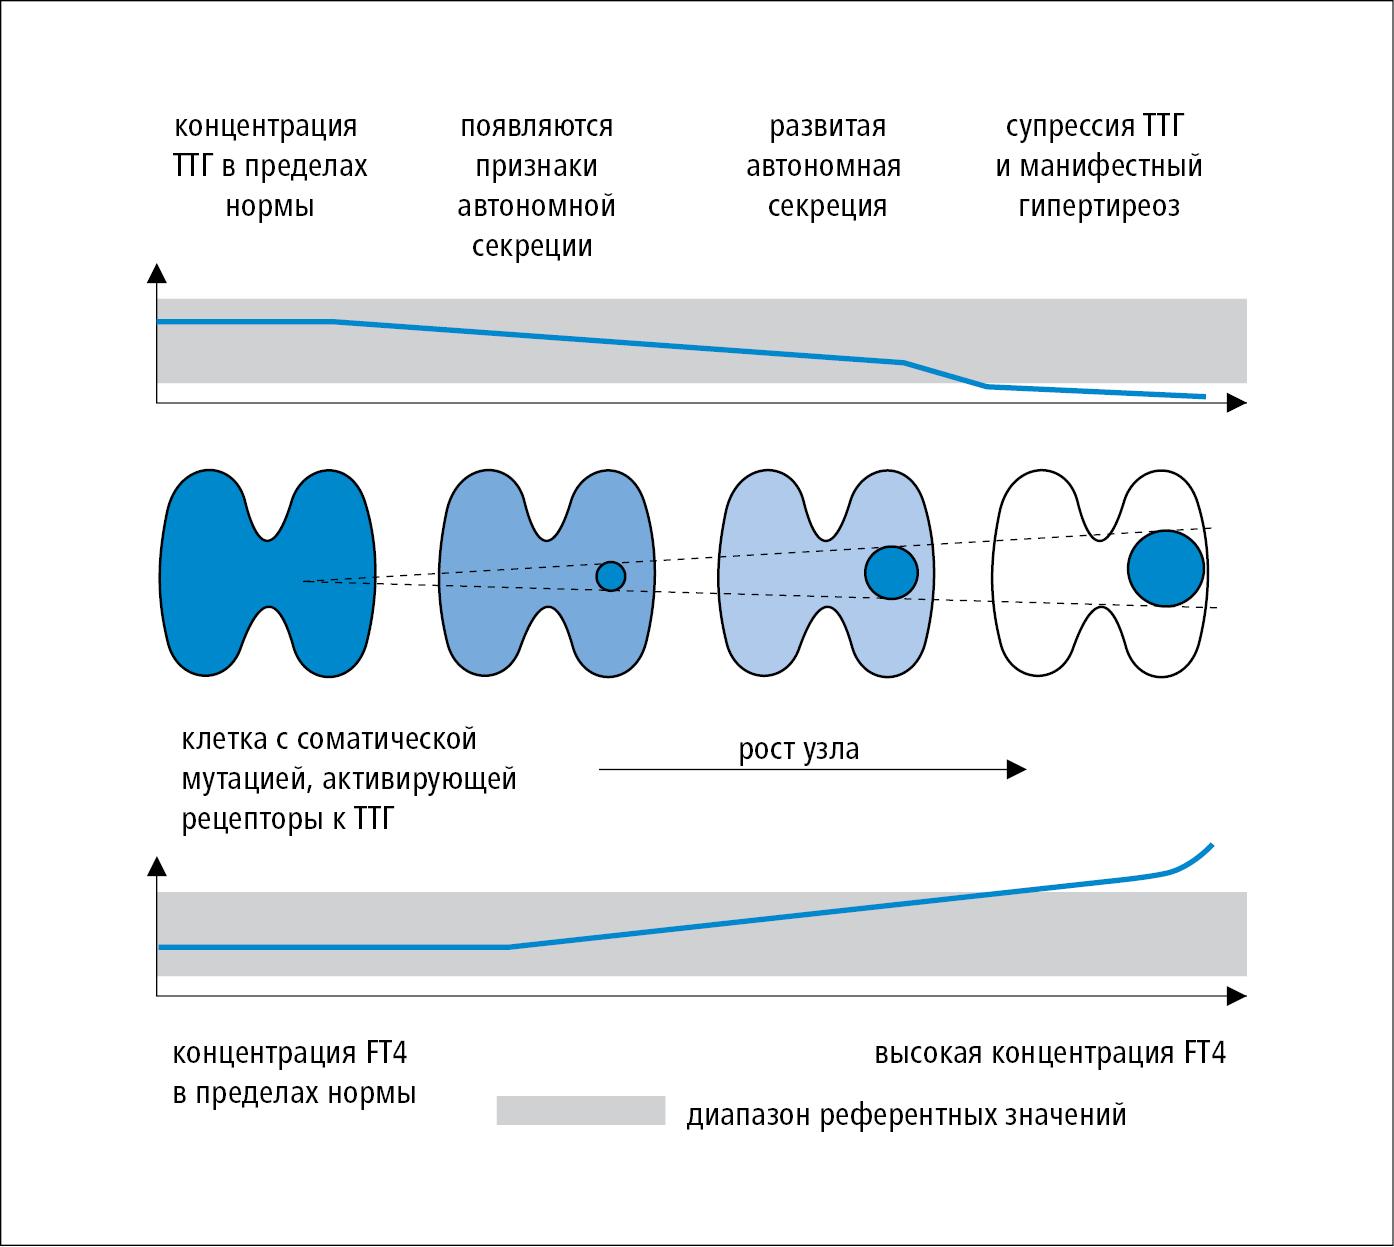 hipertenzije i hipertireozom)